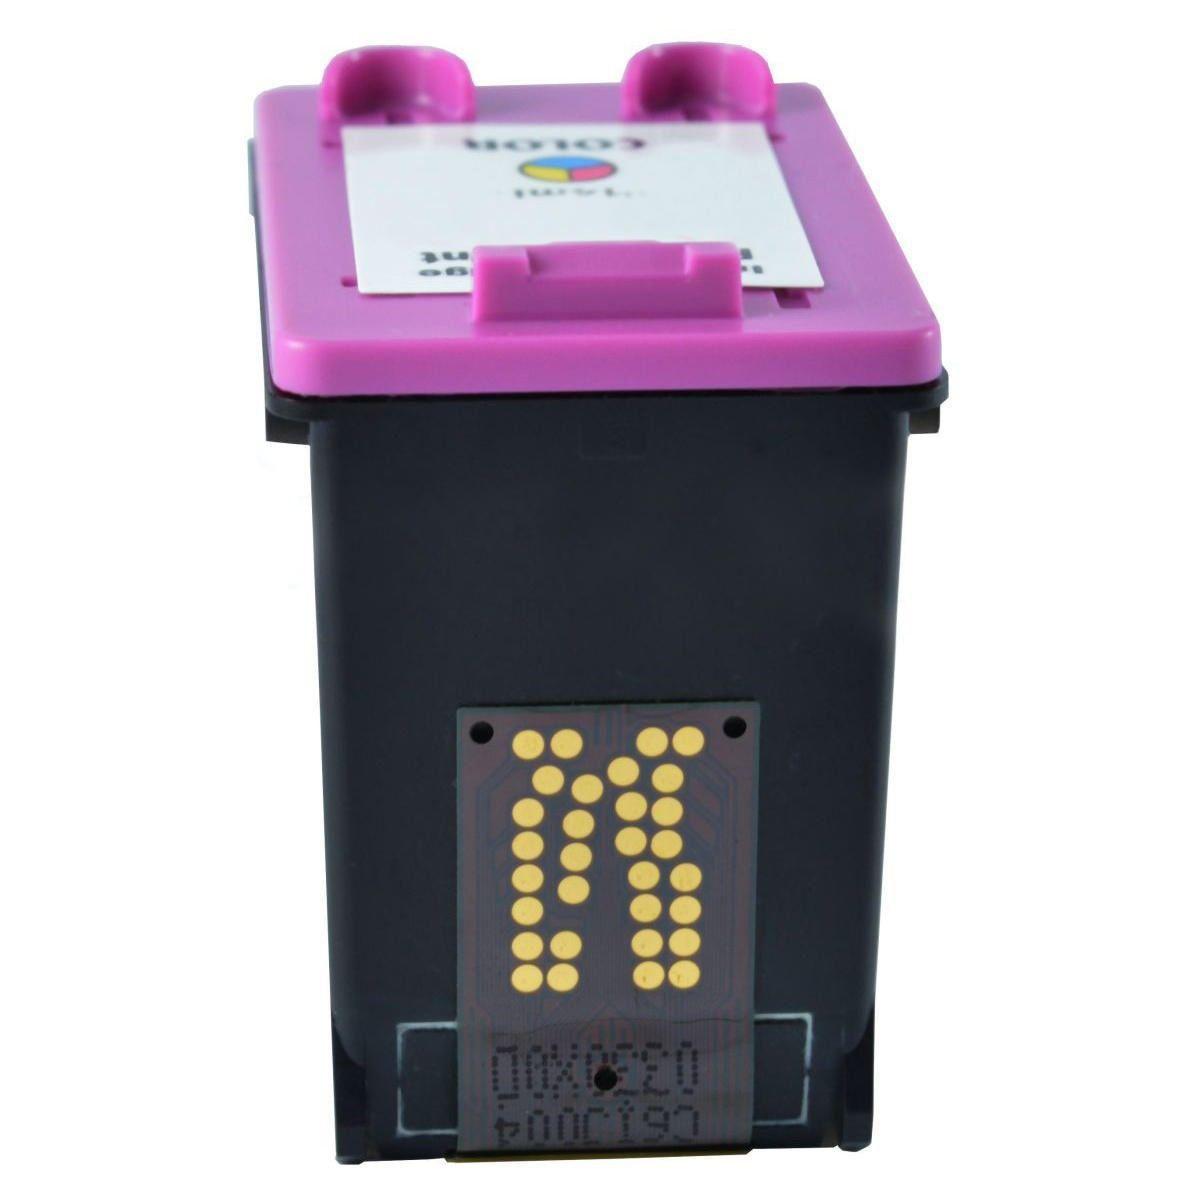 Compatível: Cartucho de Tinta 664xl 664 para Impressora HP 1115 2136 3636 3836 4536 3776 4676 / Colorido / 12ml